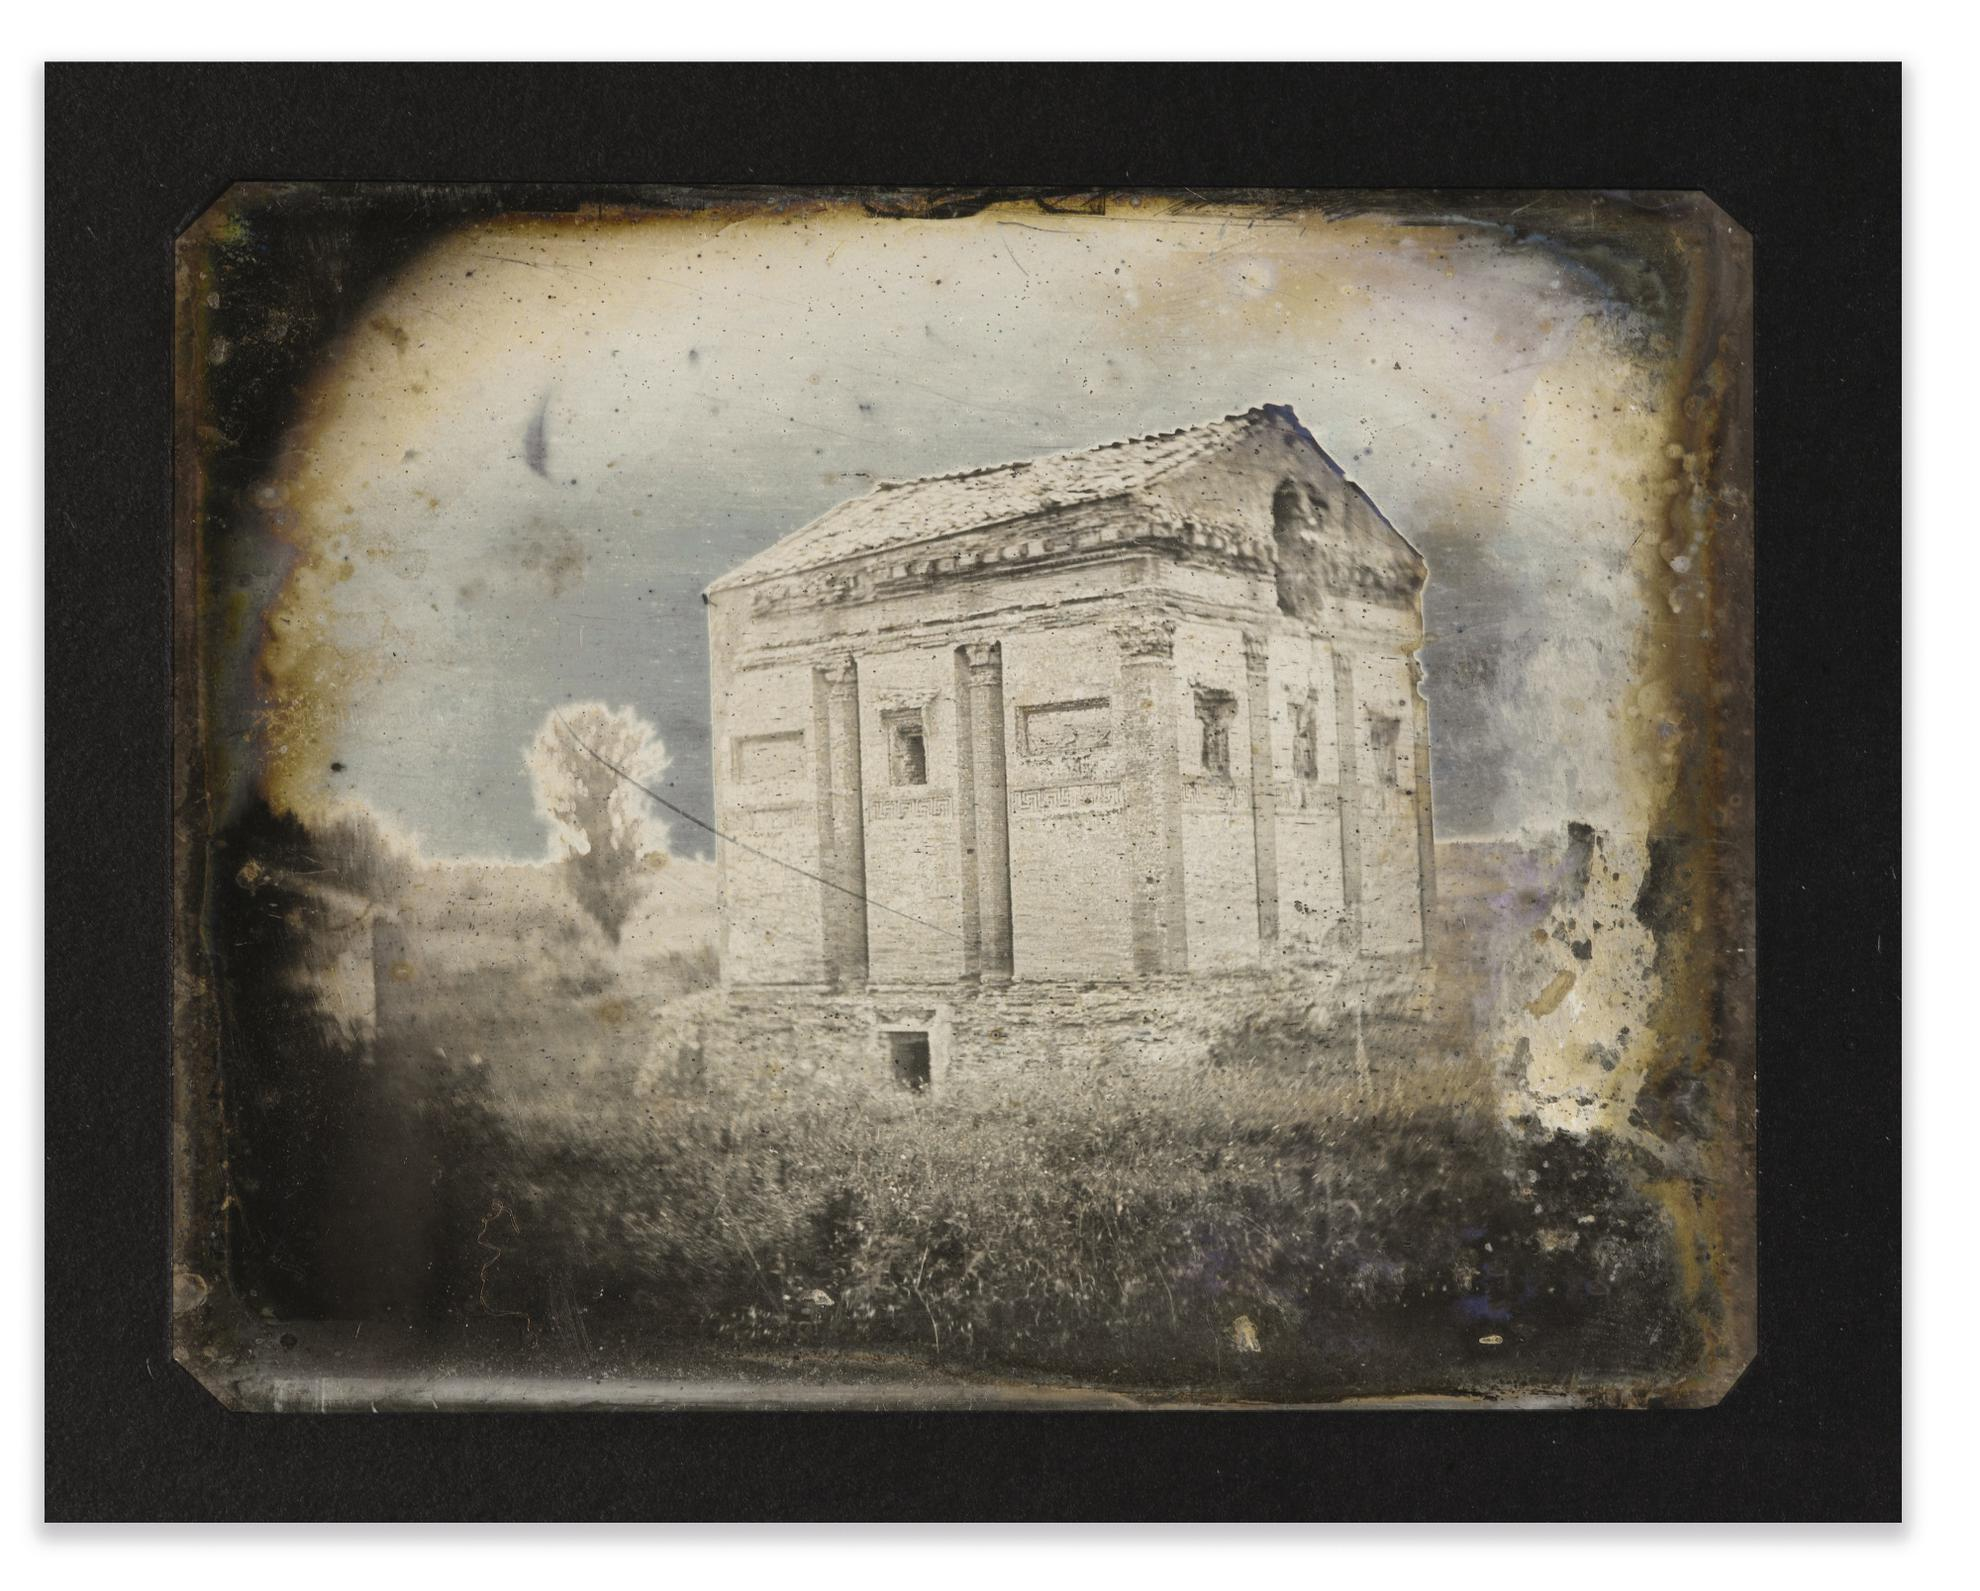 Joseph Philibert Girault De Prangey - 69. Pres De Rome, Temple Del Dio Redicolo-1842